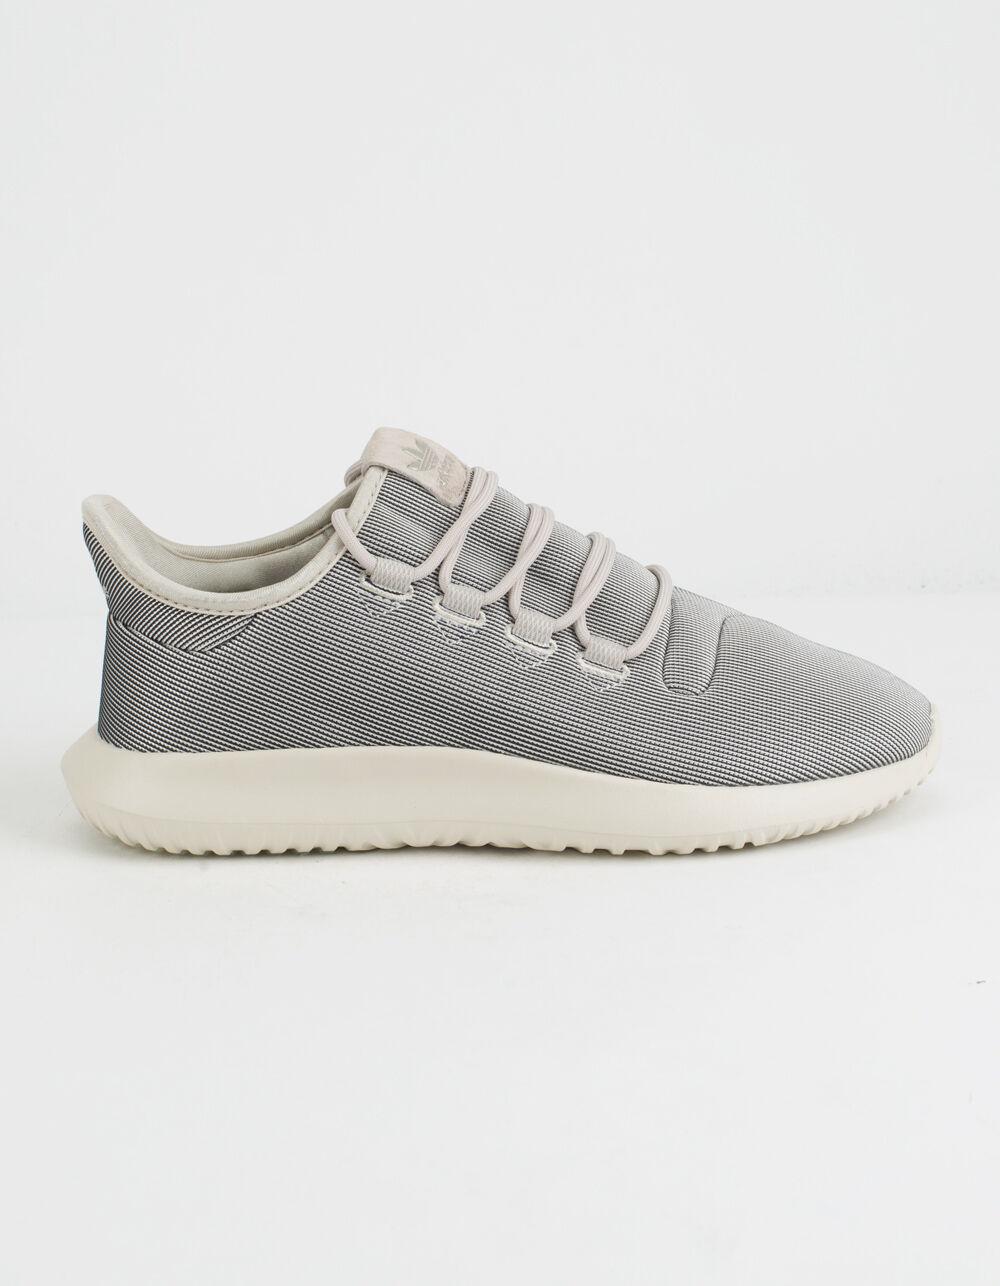 ADIDAS Tubular Shadow Platinum Metallic Shoes